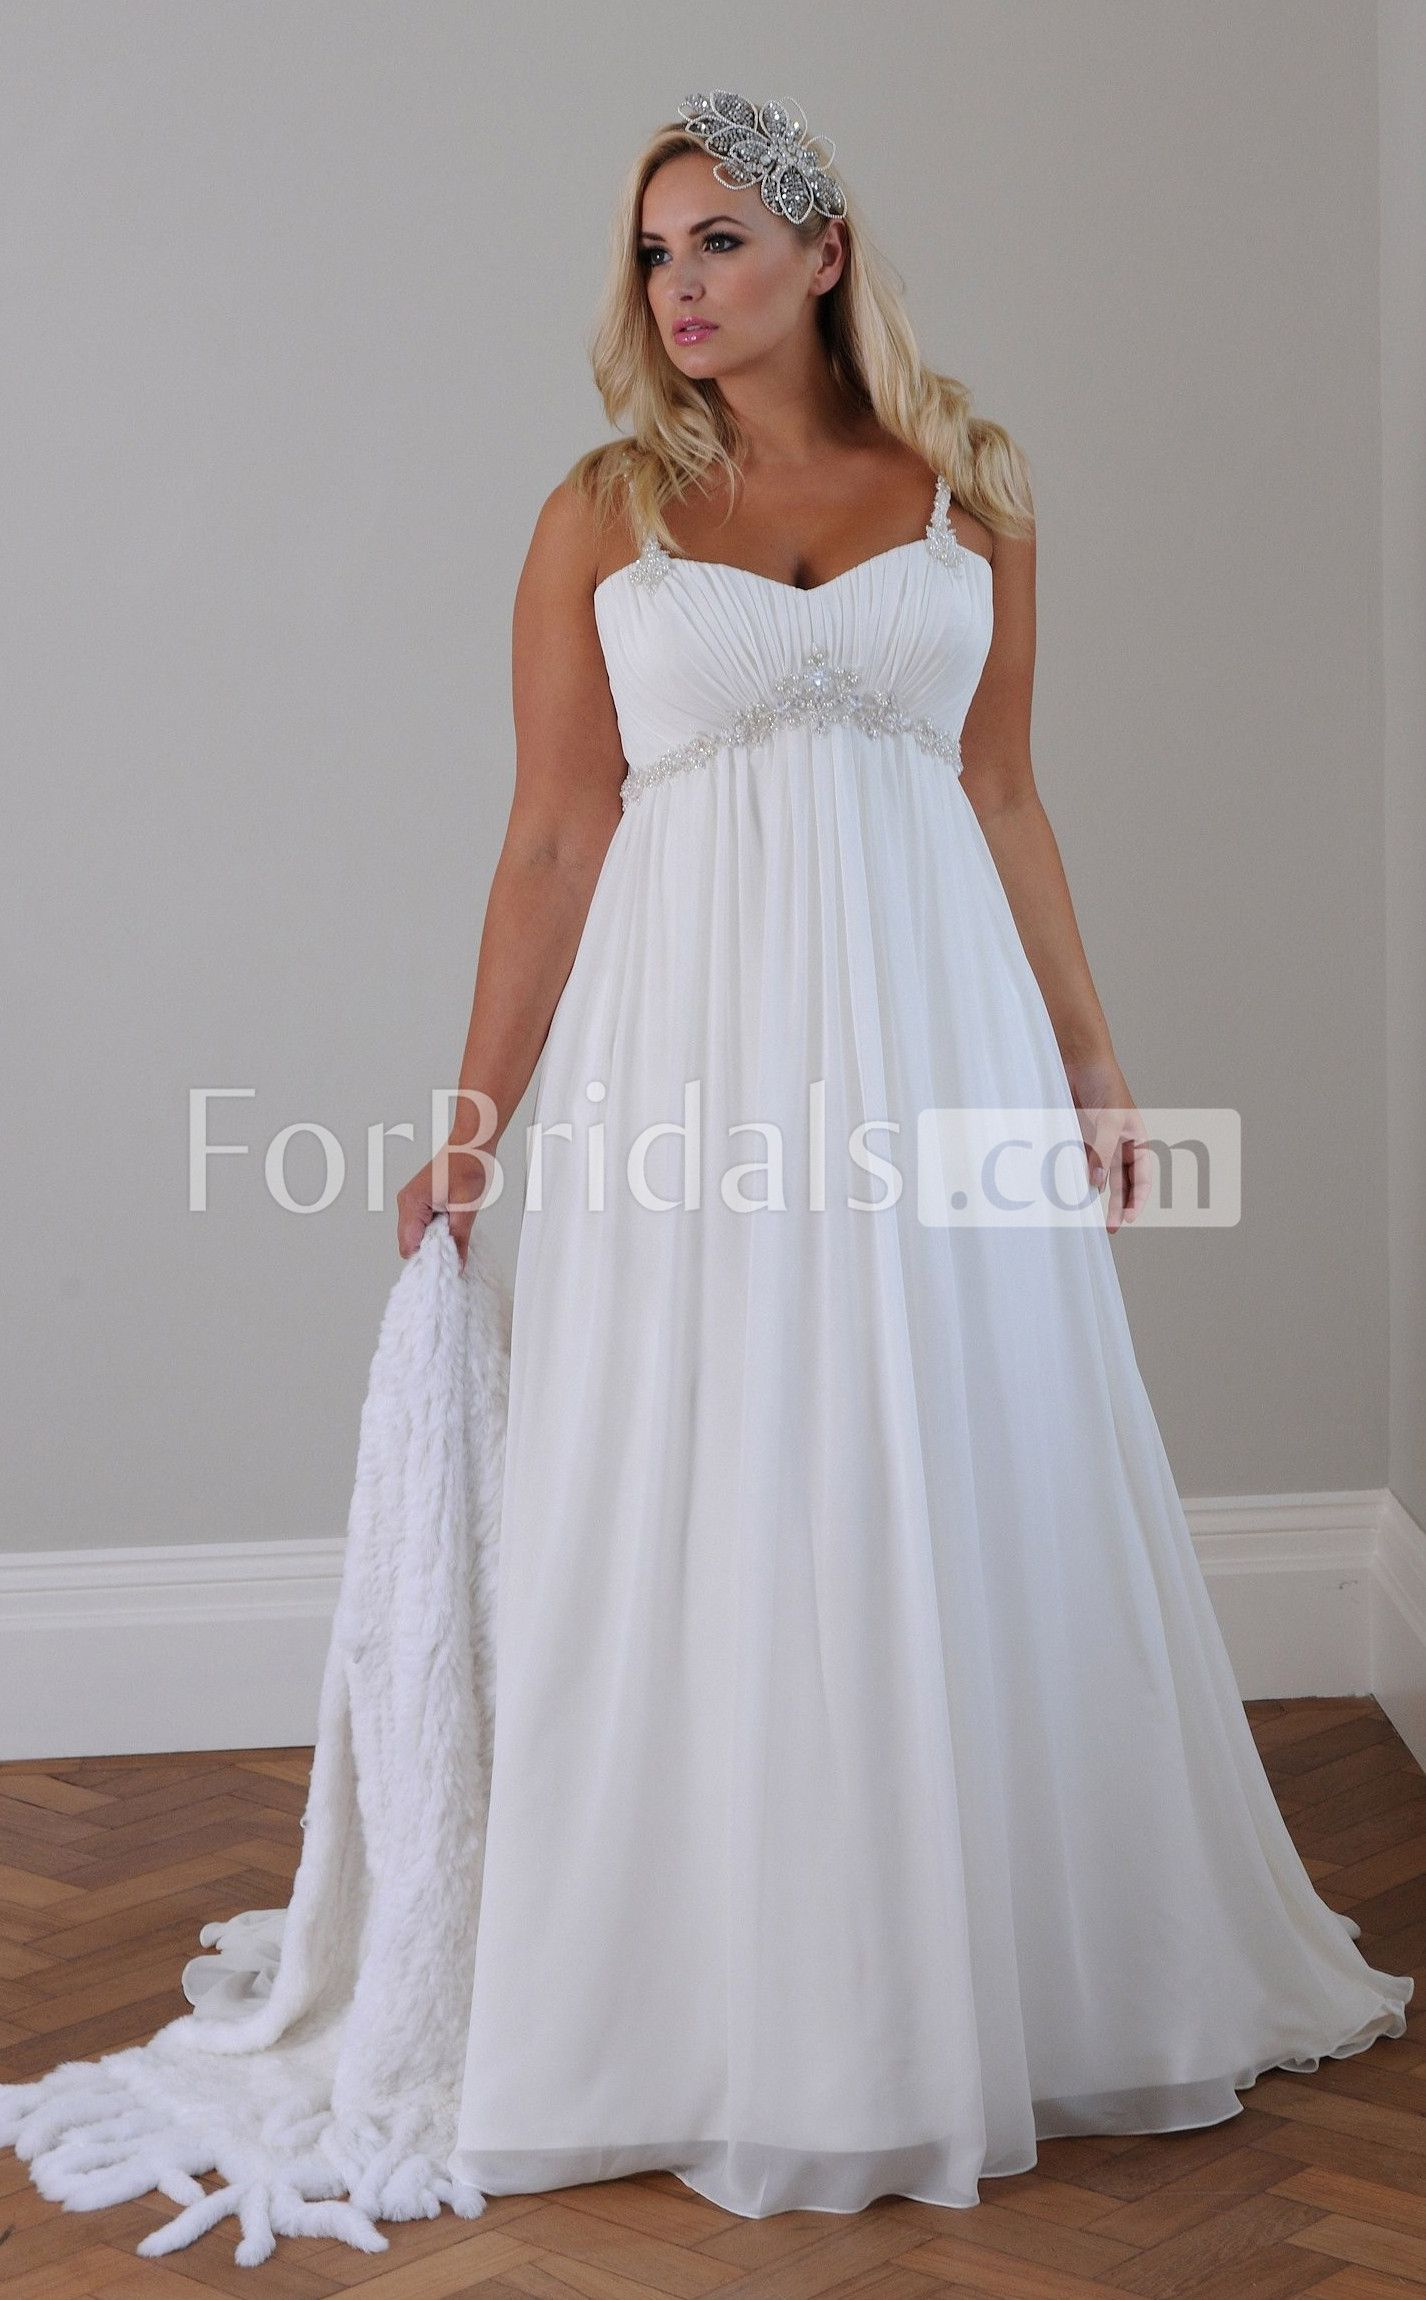 Plus size wedding dresses wedding pinterest wedding dress